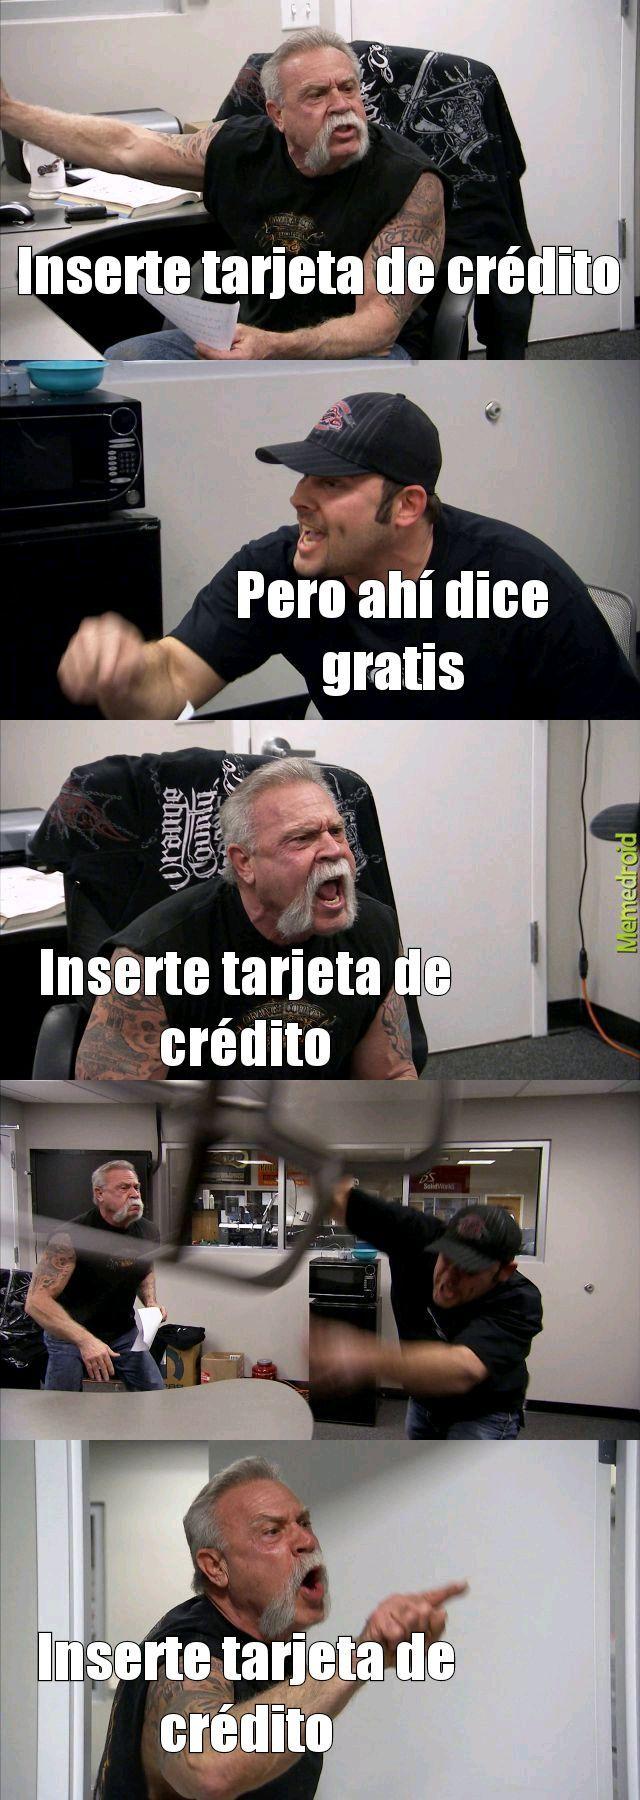 Inserte tarjeta de crédito - meme